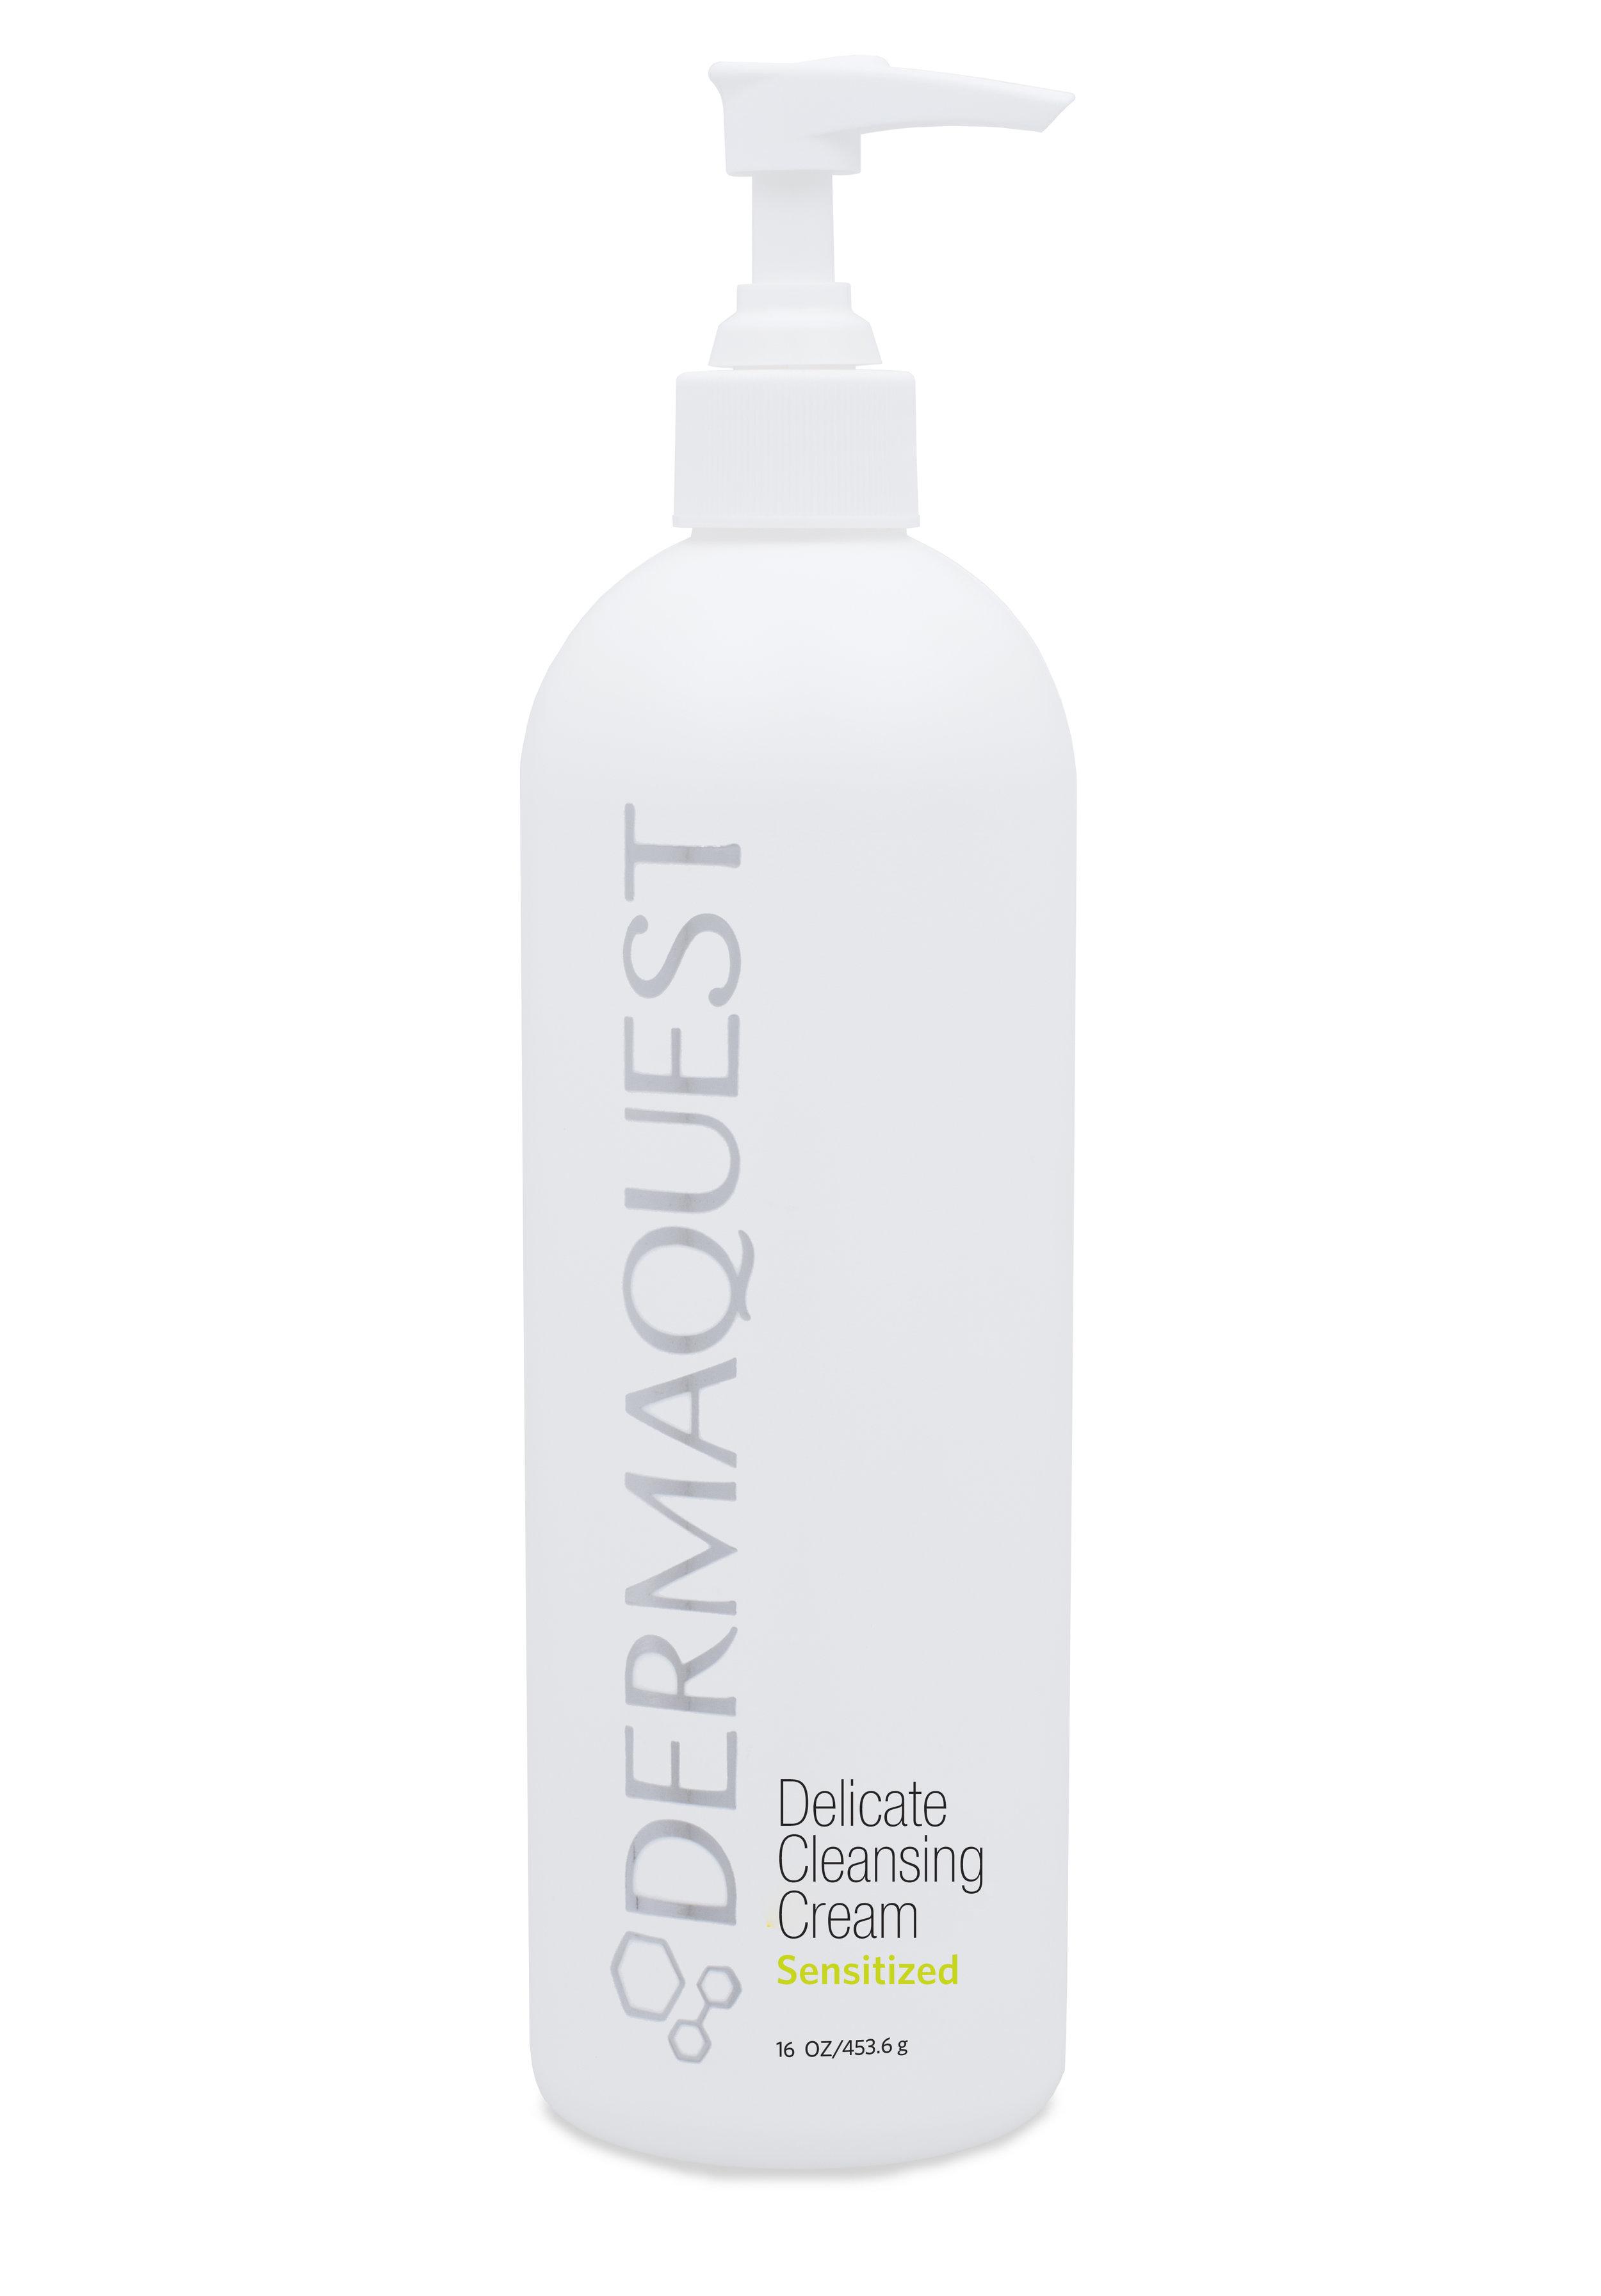 Sensitized Delicate Cleansing Cream 16oz.jpg